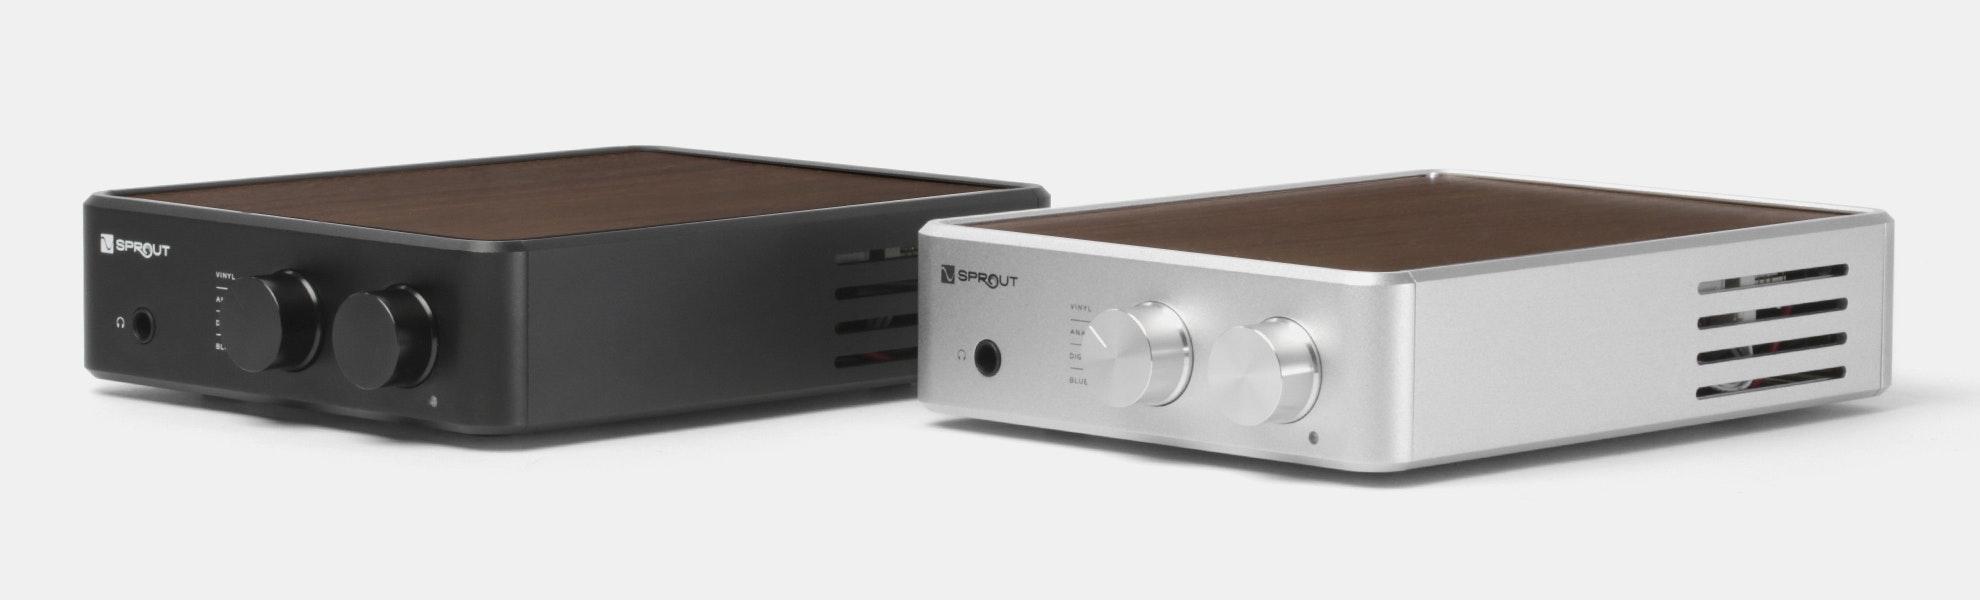 Massdrop x PS Audio Sprout II